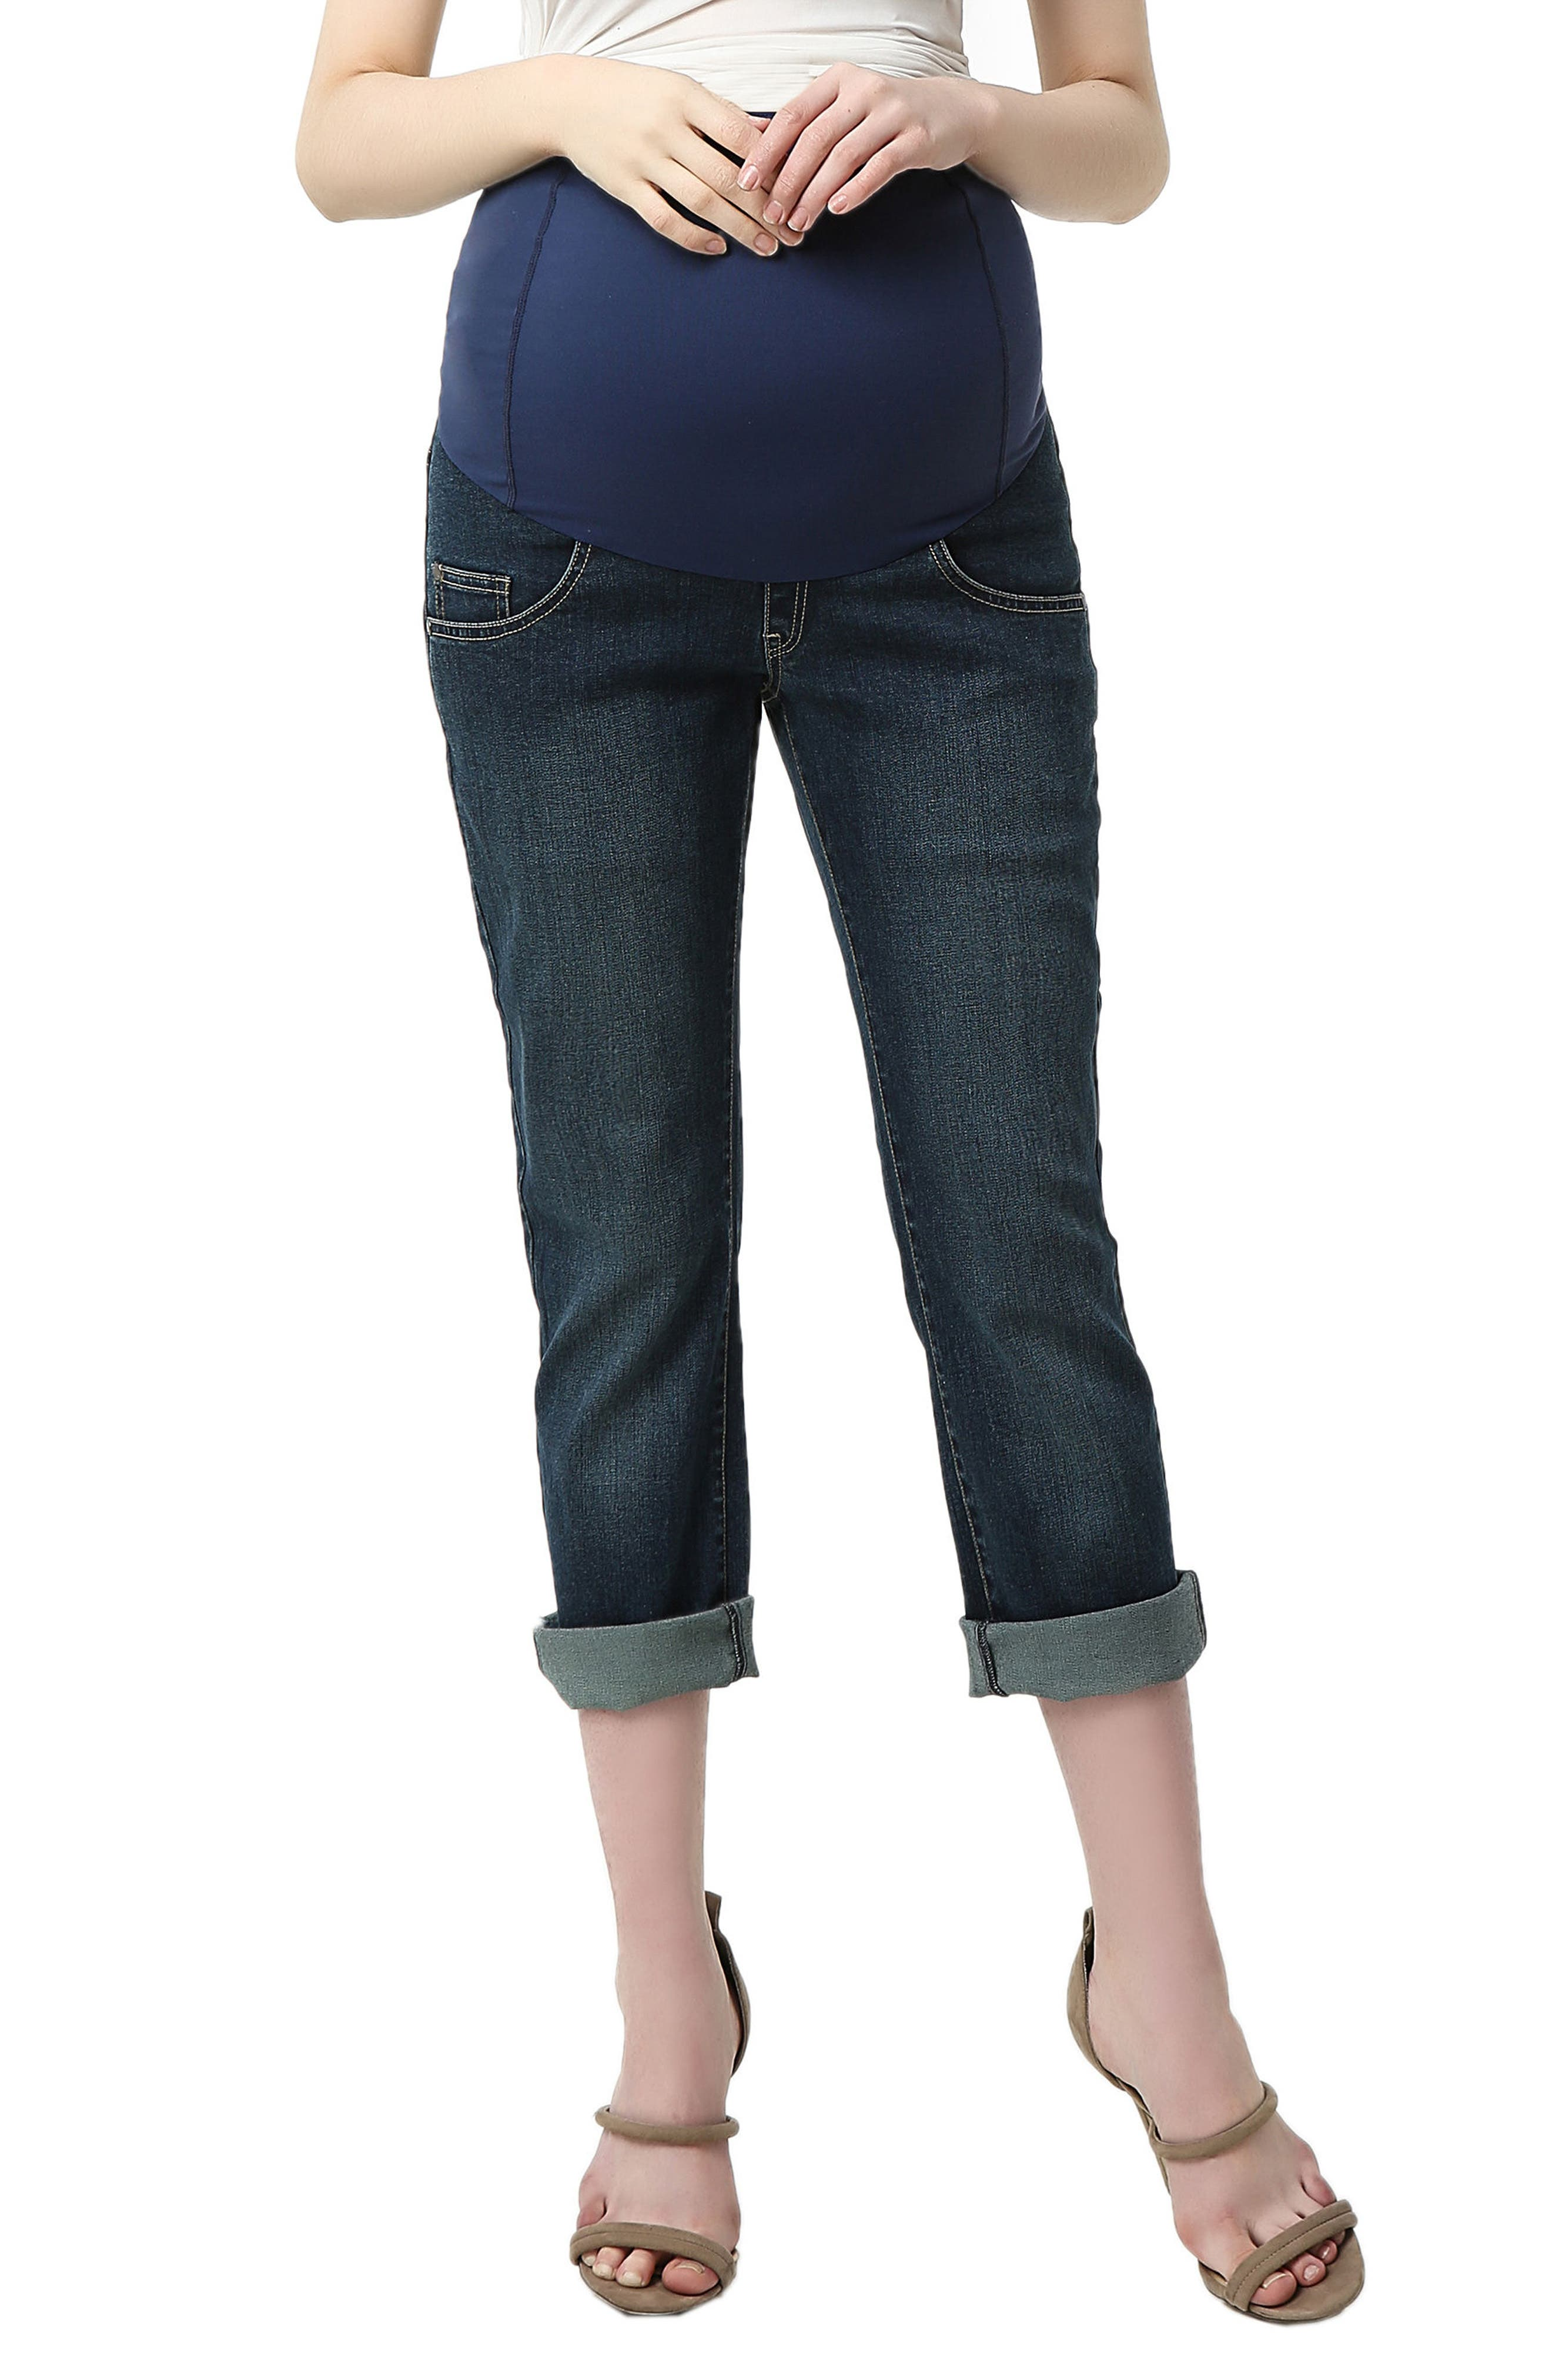 Women's Kimi And Kai Jodie Crop Girlfriend Maternity Jeans